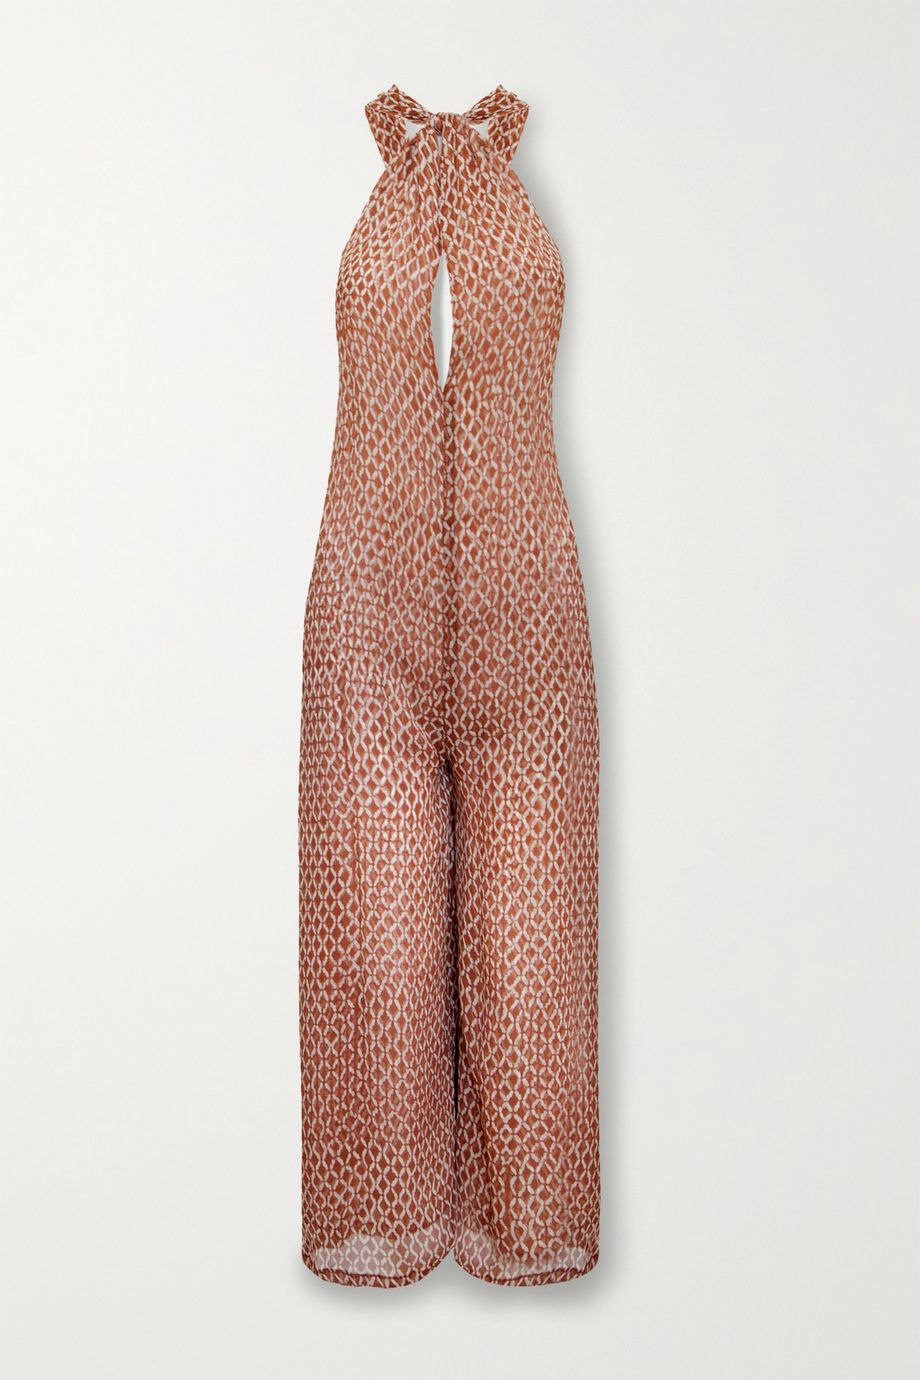 Cloe Cassandro + NET SUSTAIN Ruby layered printed silk halterneck jumpsuit